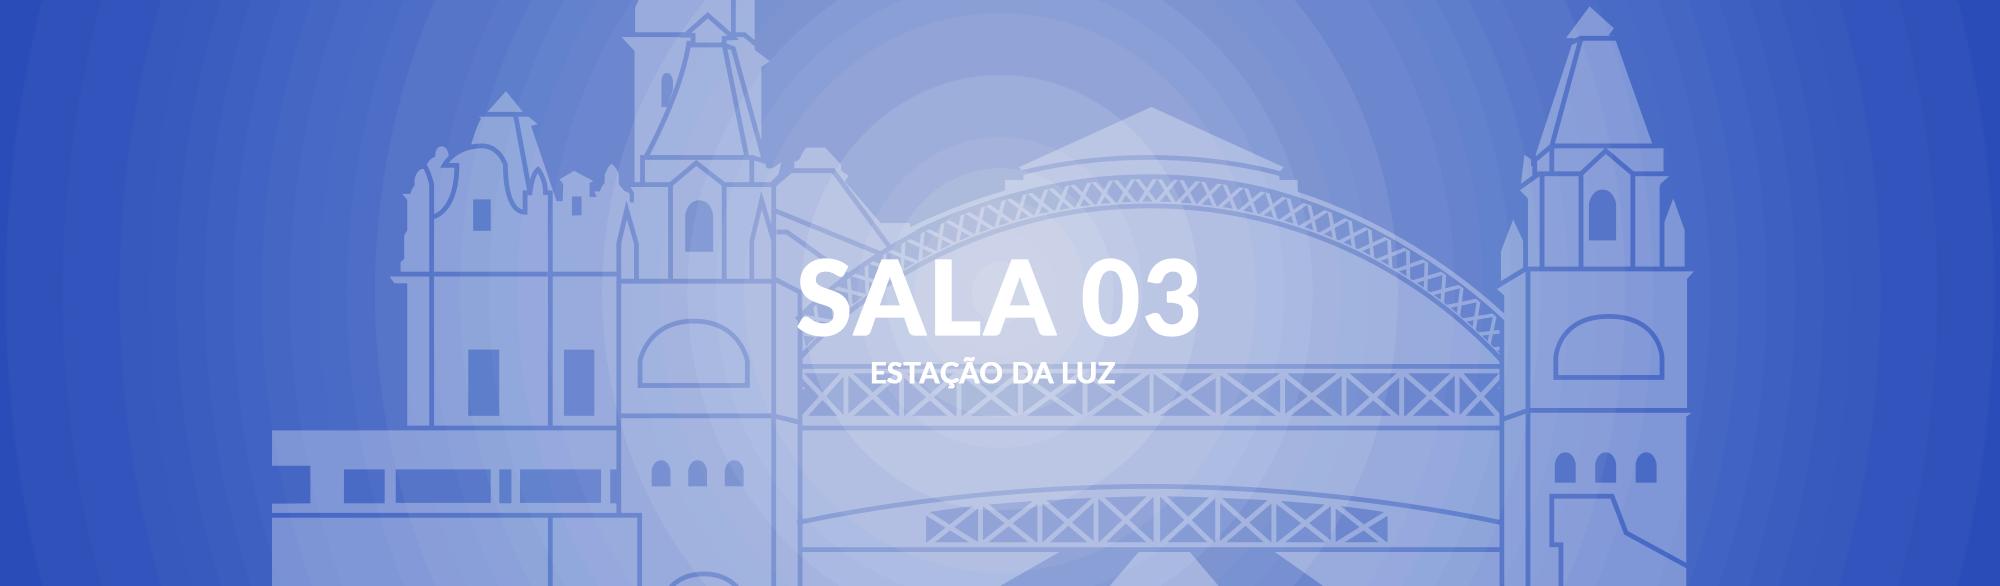 Banner dia02 sala03